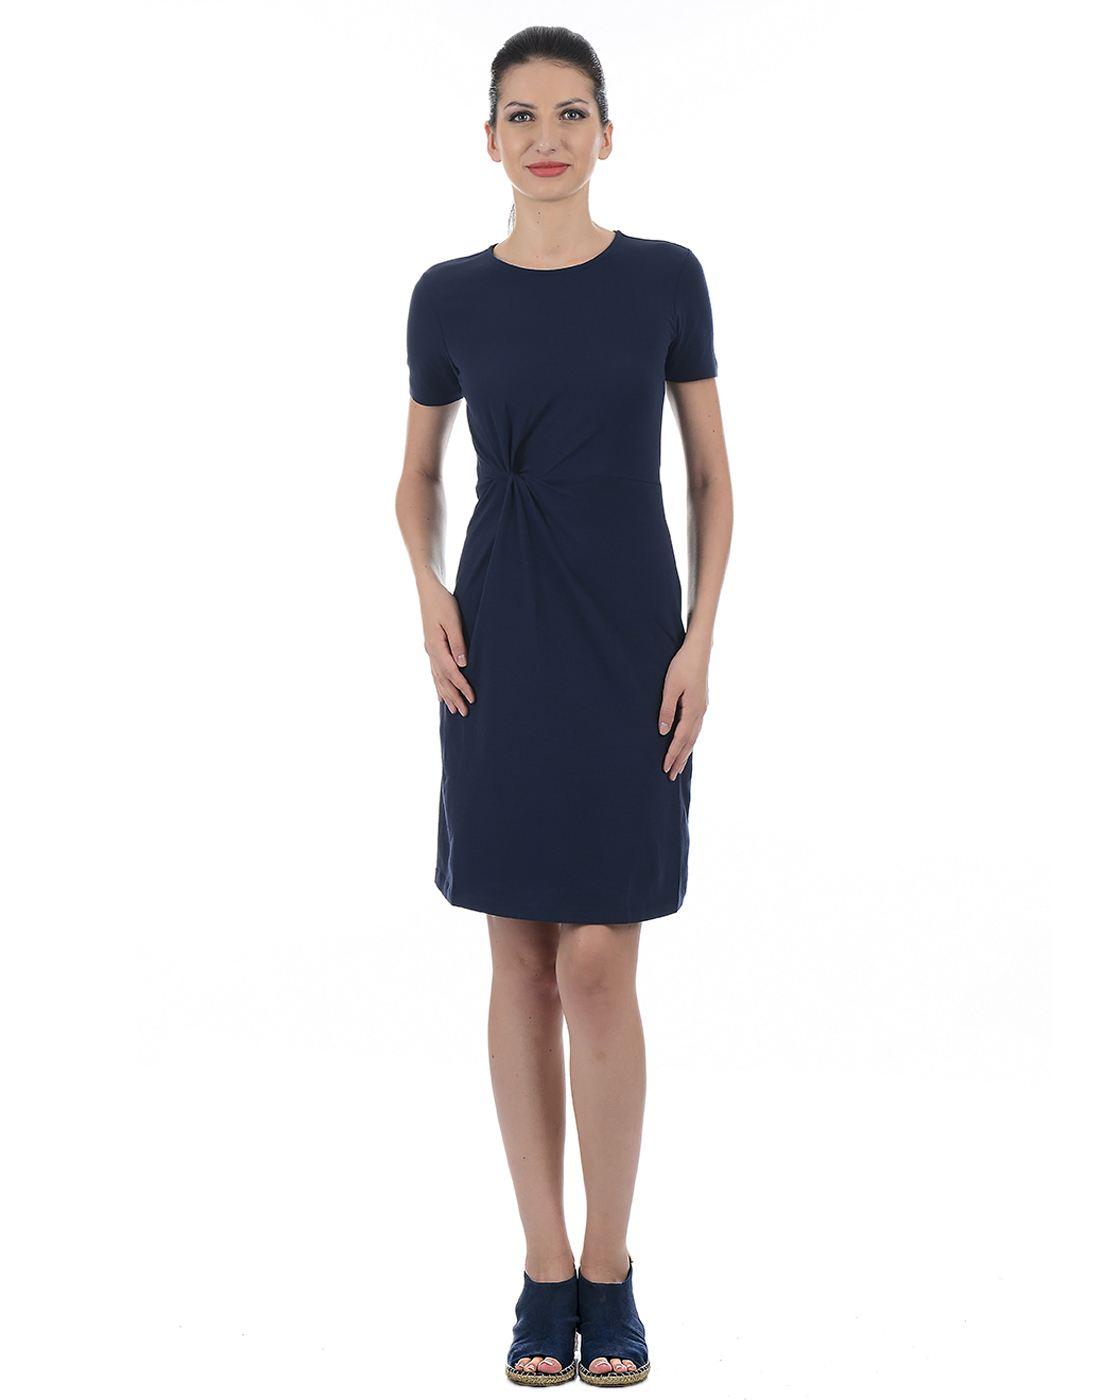 Only Women Casual Blue Dress